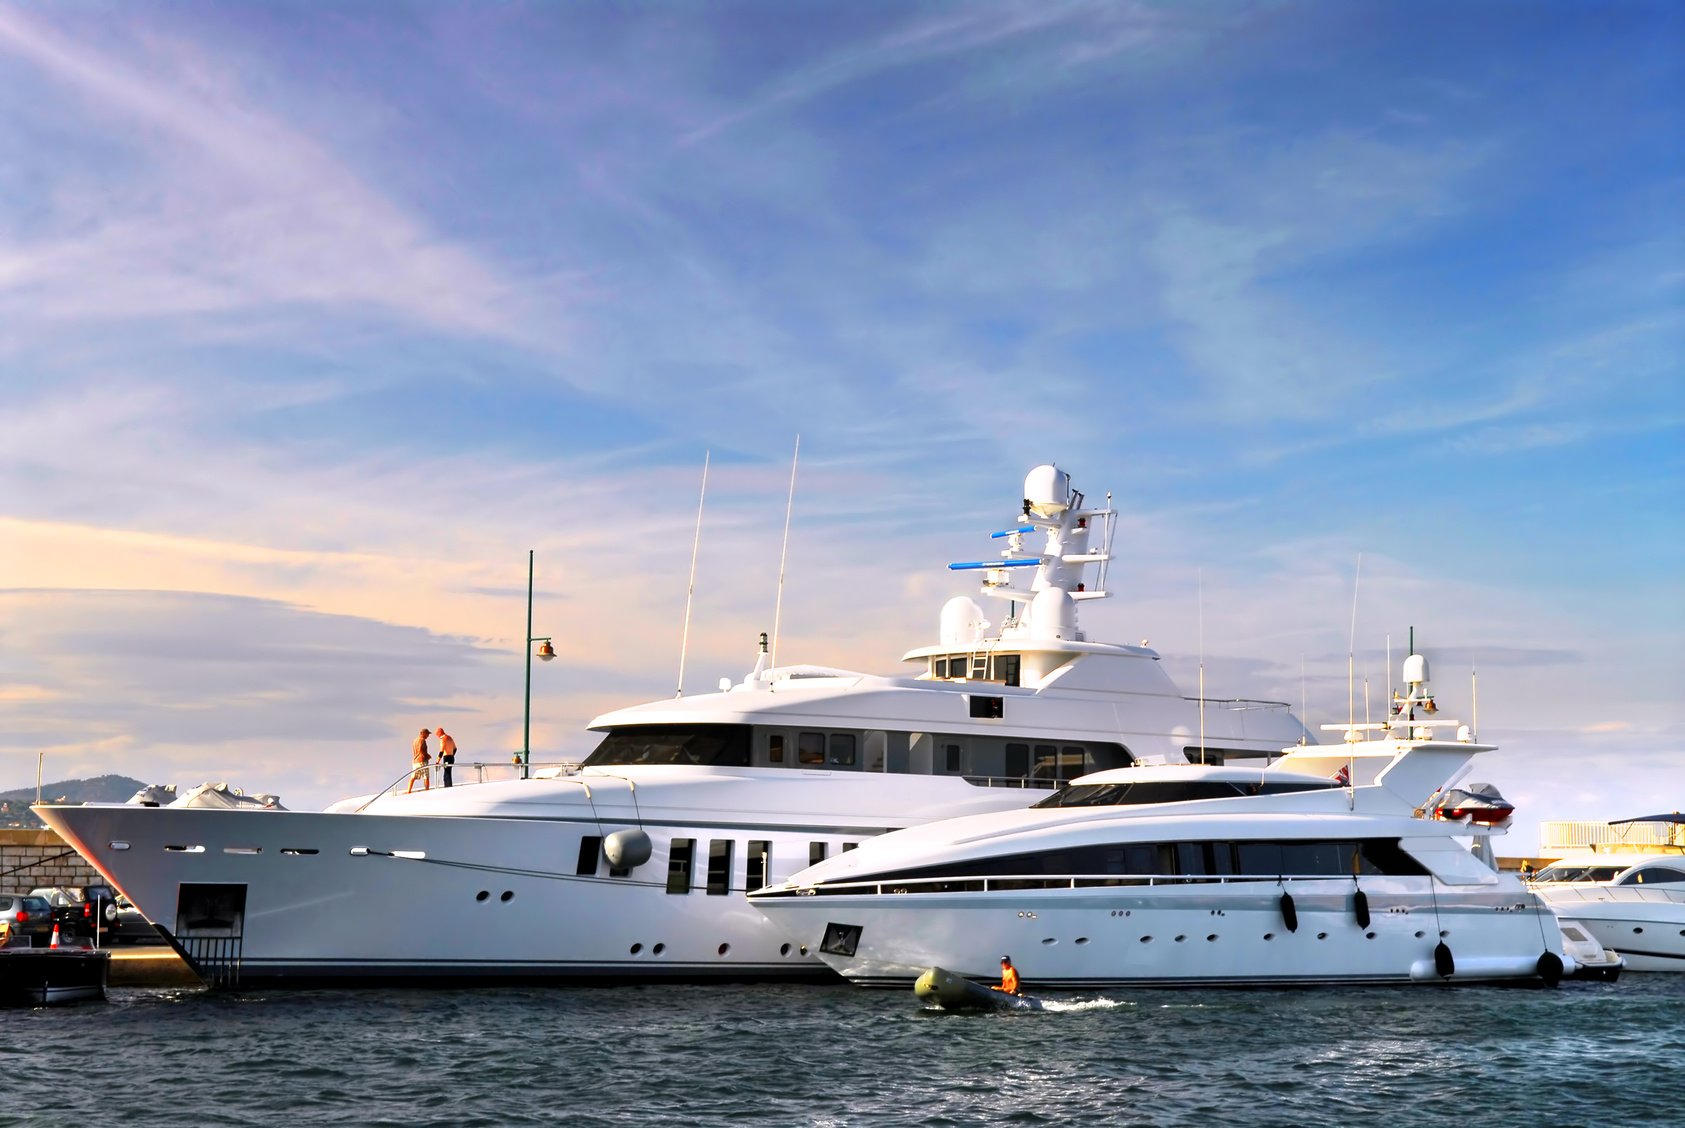 capri-yacht-charter-capri-yacht-rental-capri-boat-charter-capri-luxury-boat-capri-boat-hire-capri-boat-charter-capri-island-luxury-mega-yachts